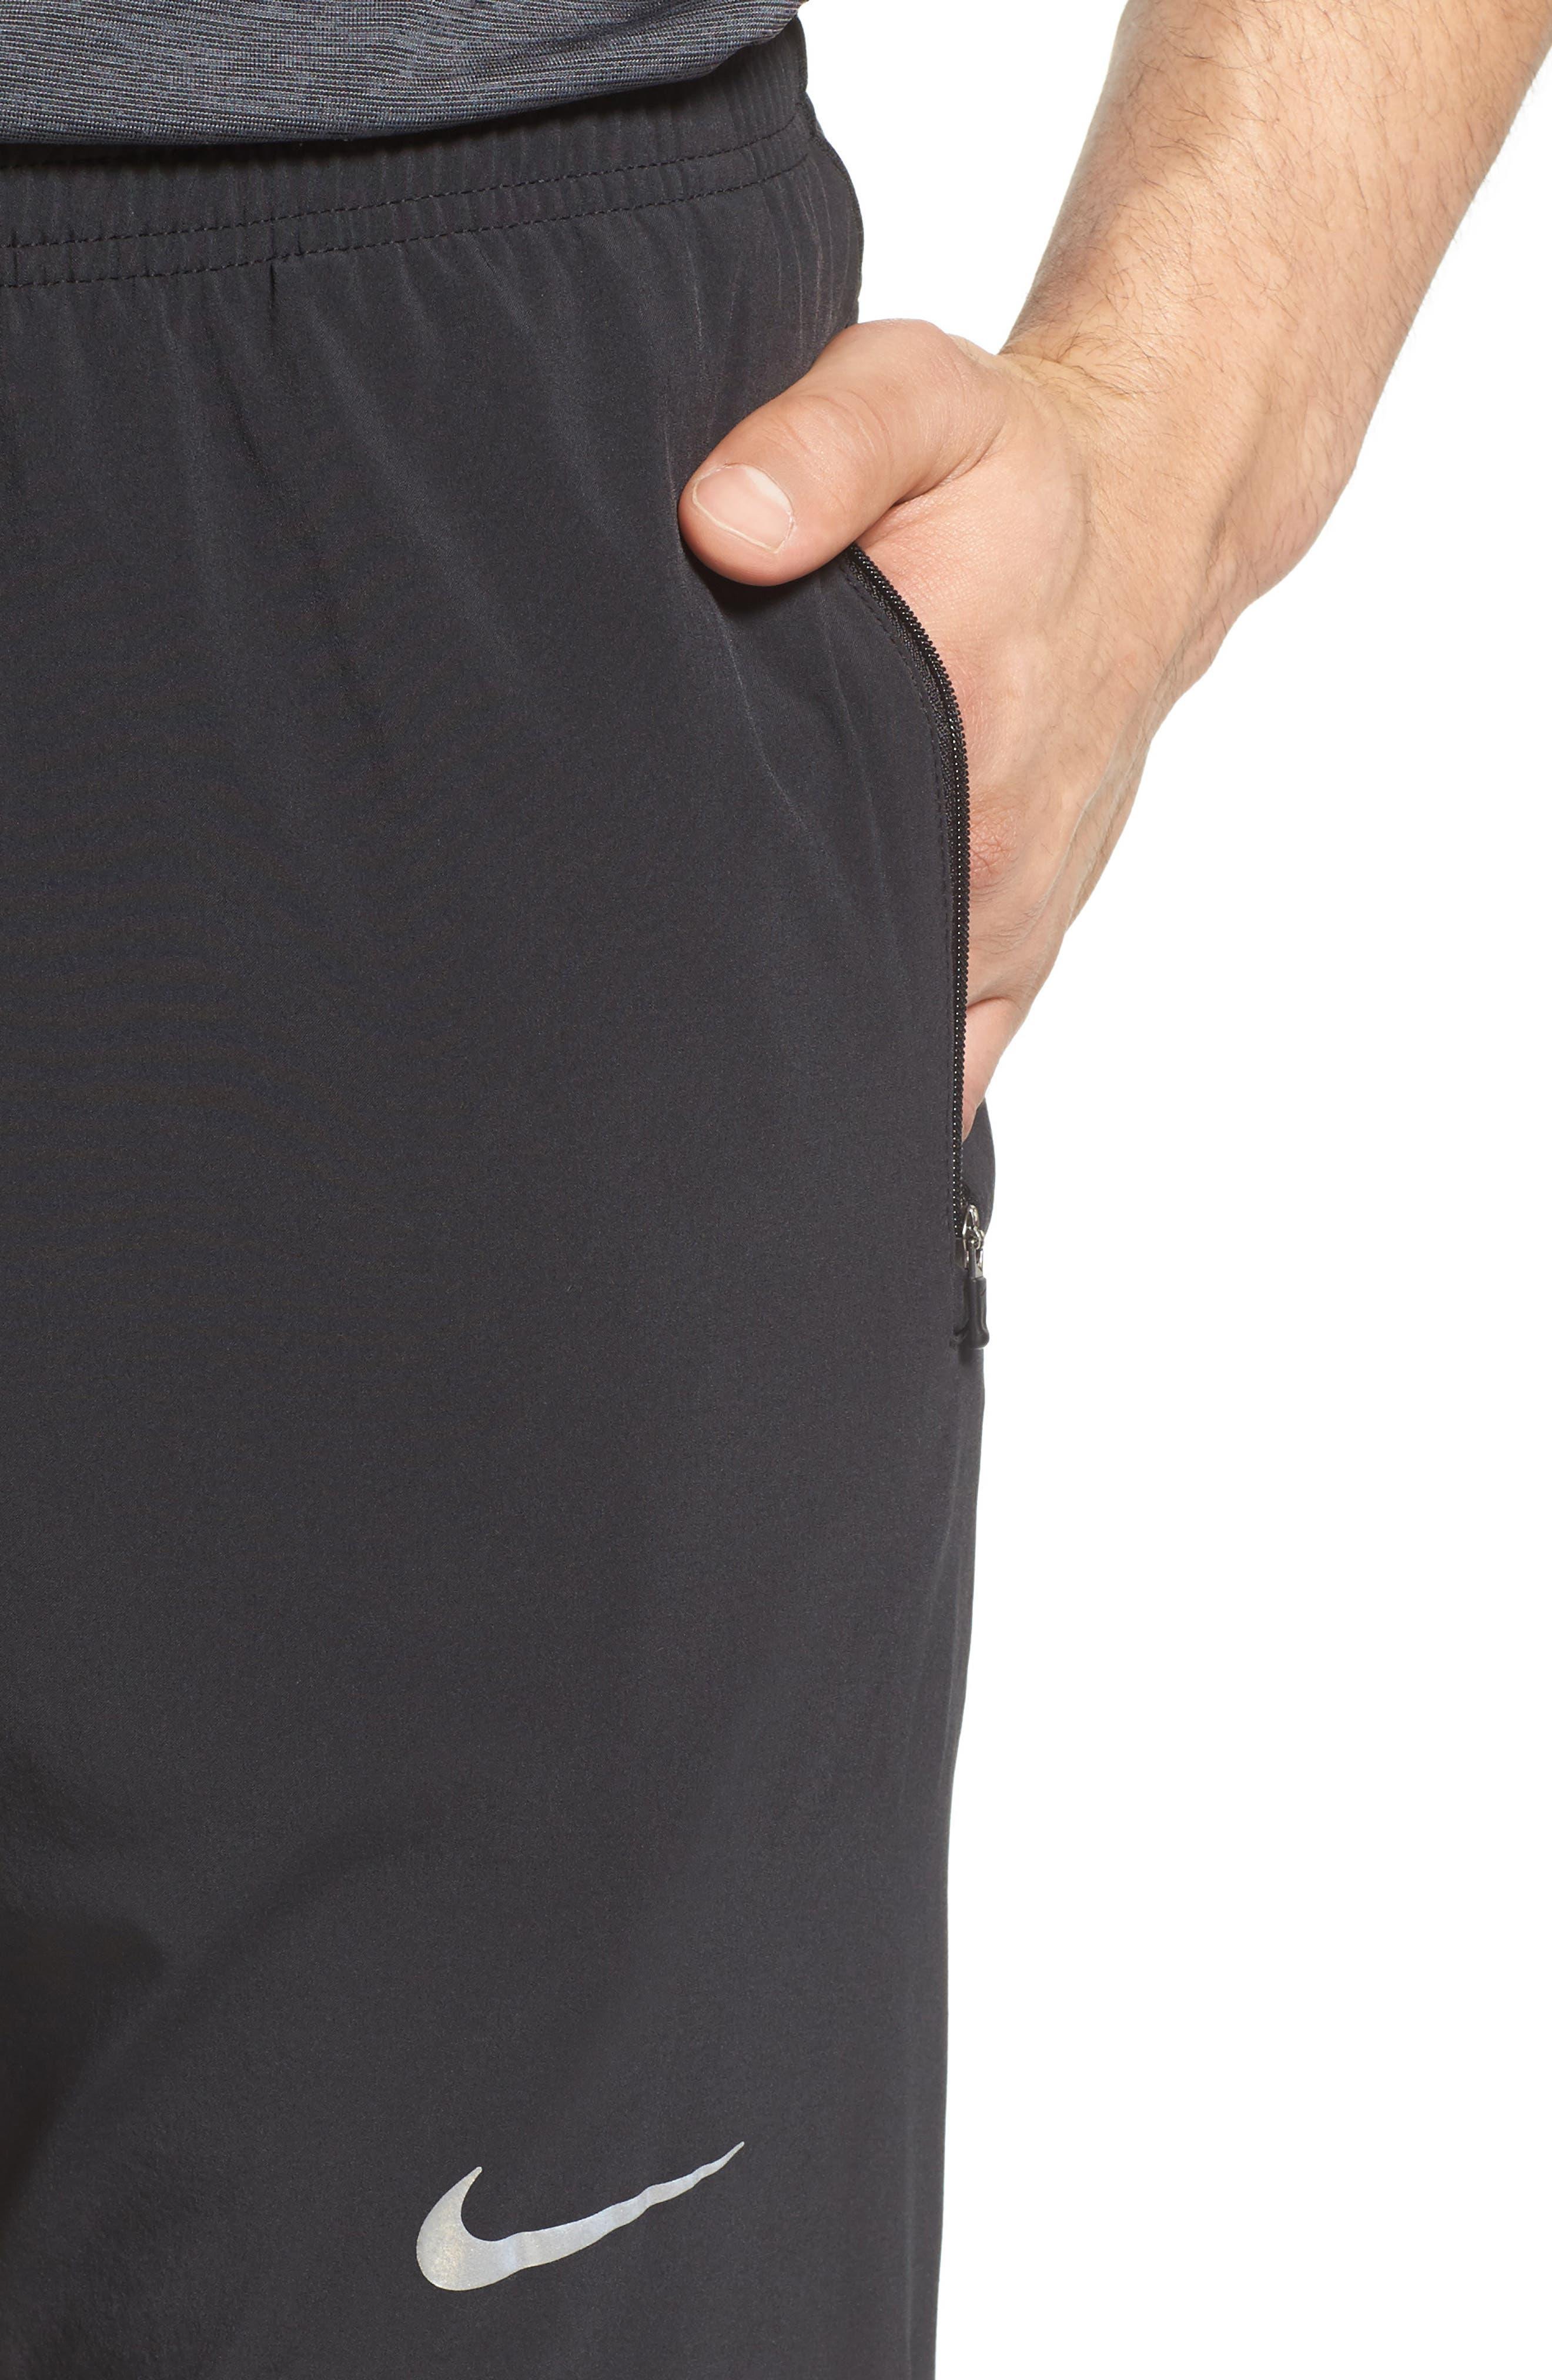 Essential Flex Running Pants,                             Alternate thumbnail 4, color,                             Black